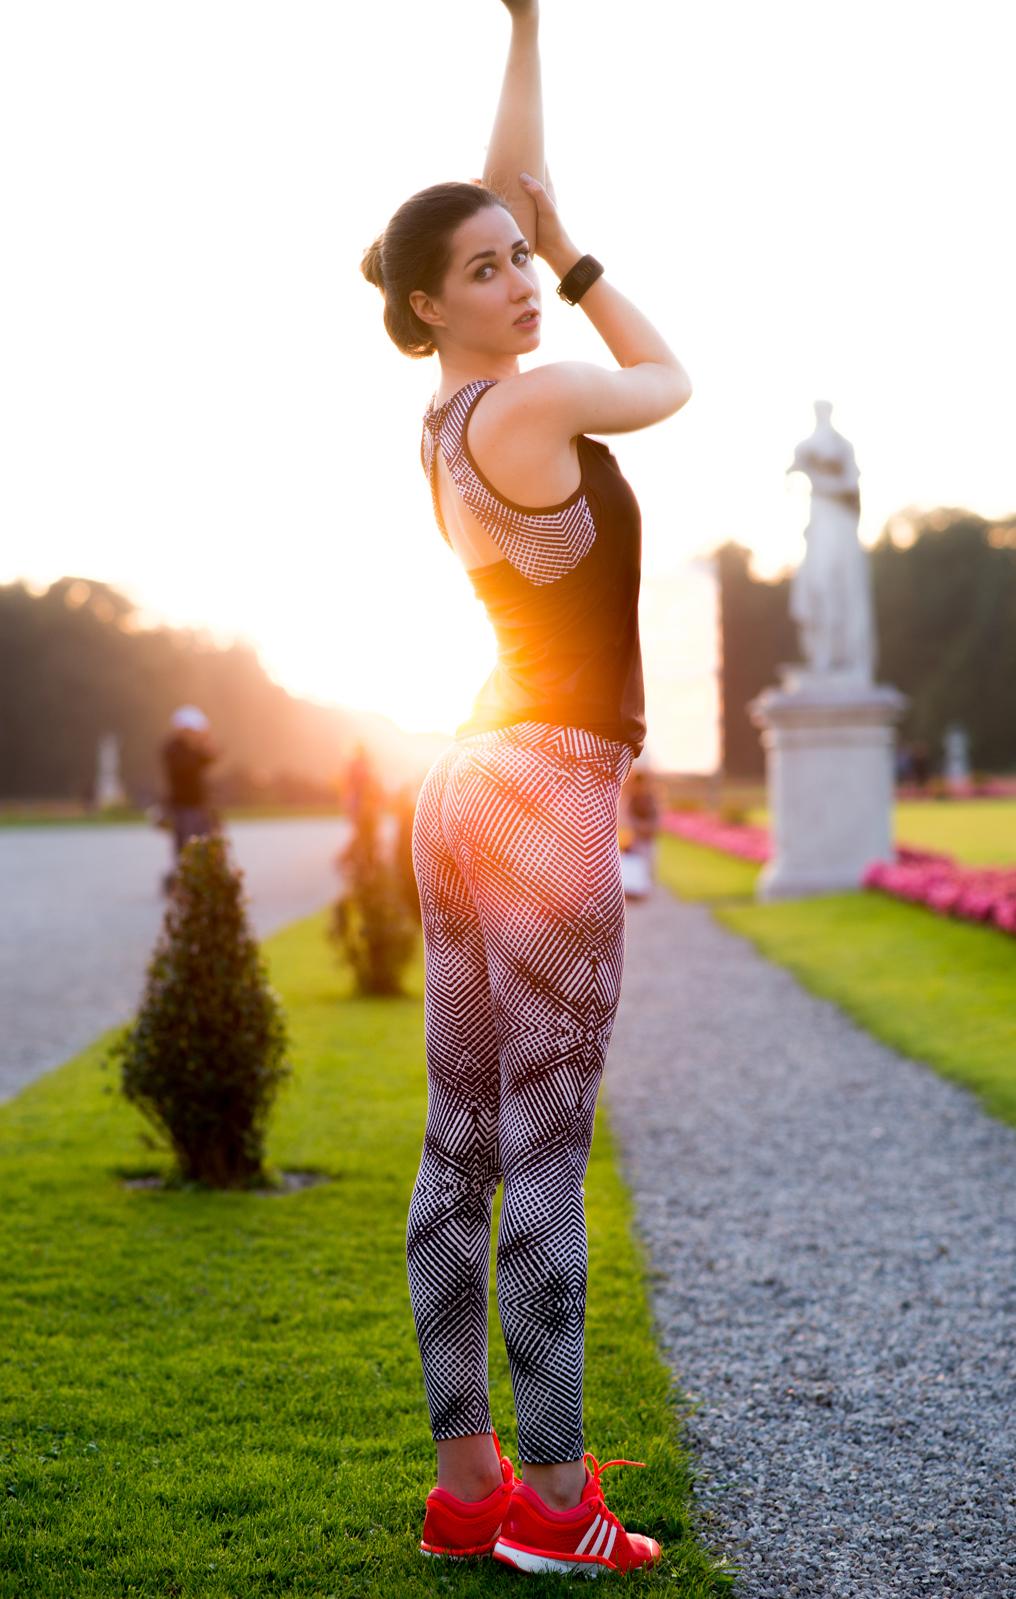 Laufoutfit-Adidas-Pink-Orange-Laufjacke-Fitnessblogger-München-6